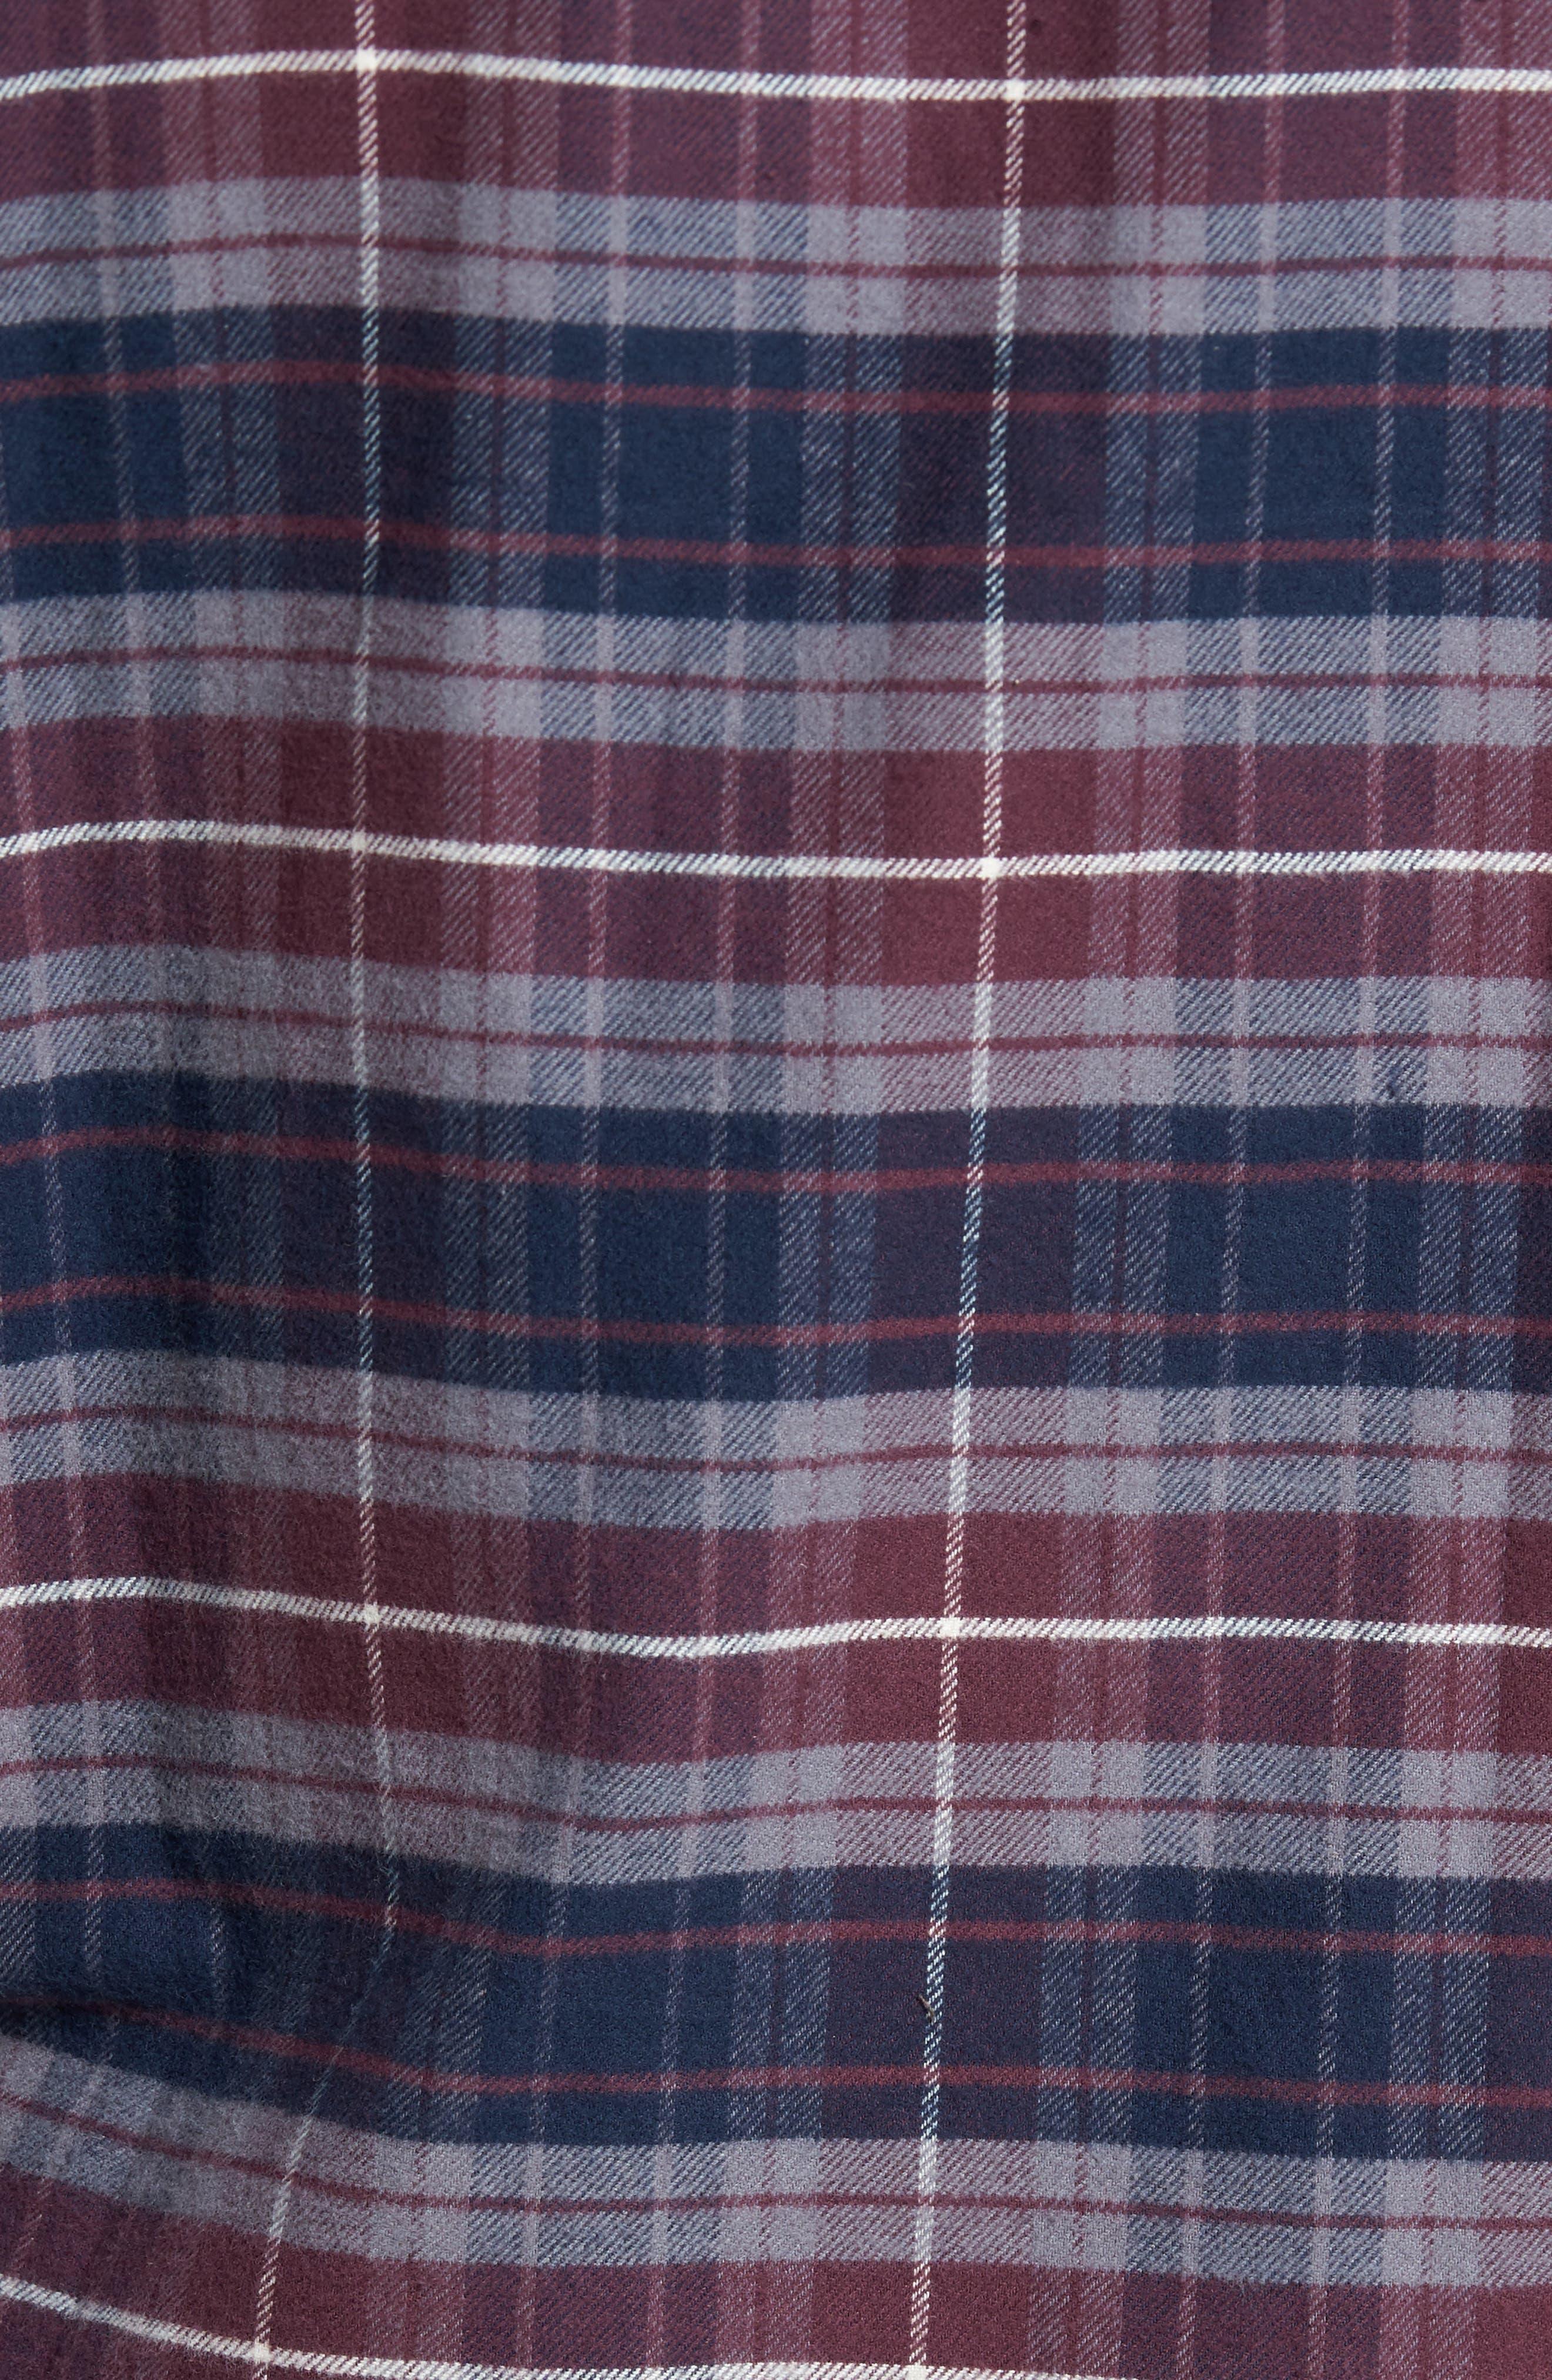 Plaid Flannel Sport Shirt,                             Alternate thumbnail 5, color,                             Raspberry Fudge Trail Plaid